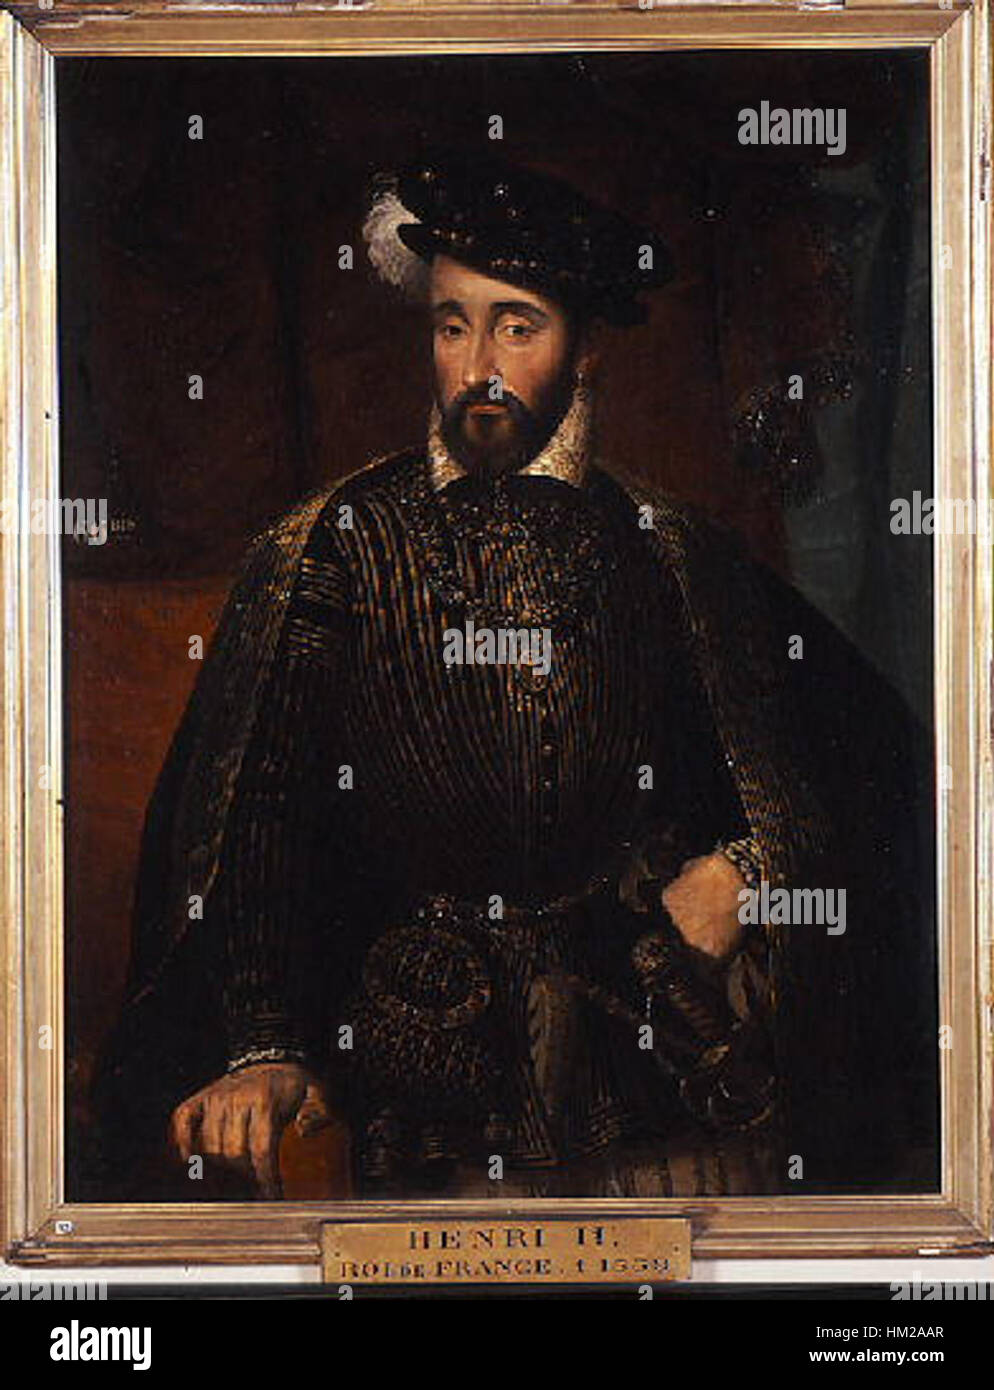 Henri 2 Roi De France : henri, france, Henri, France, Stock, Photo, Alamy